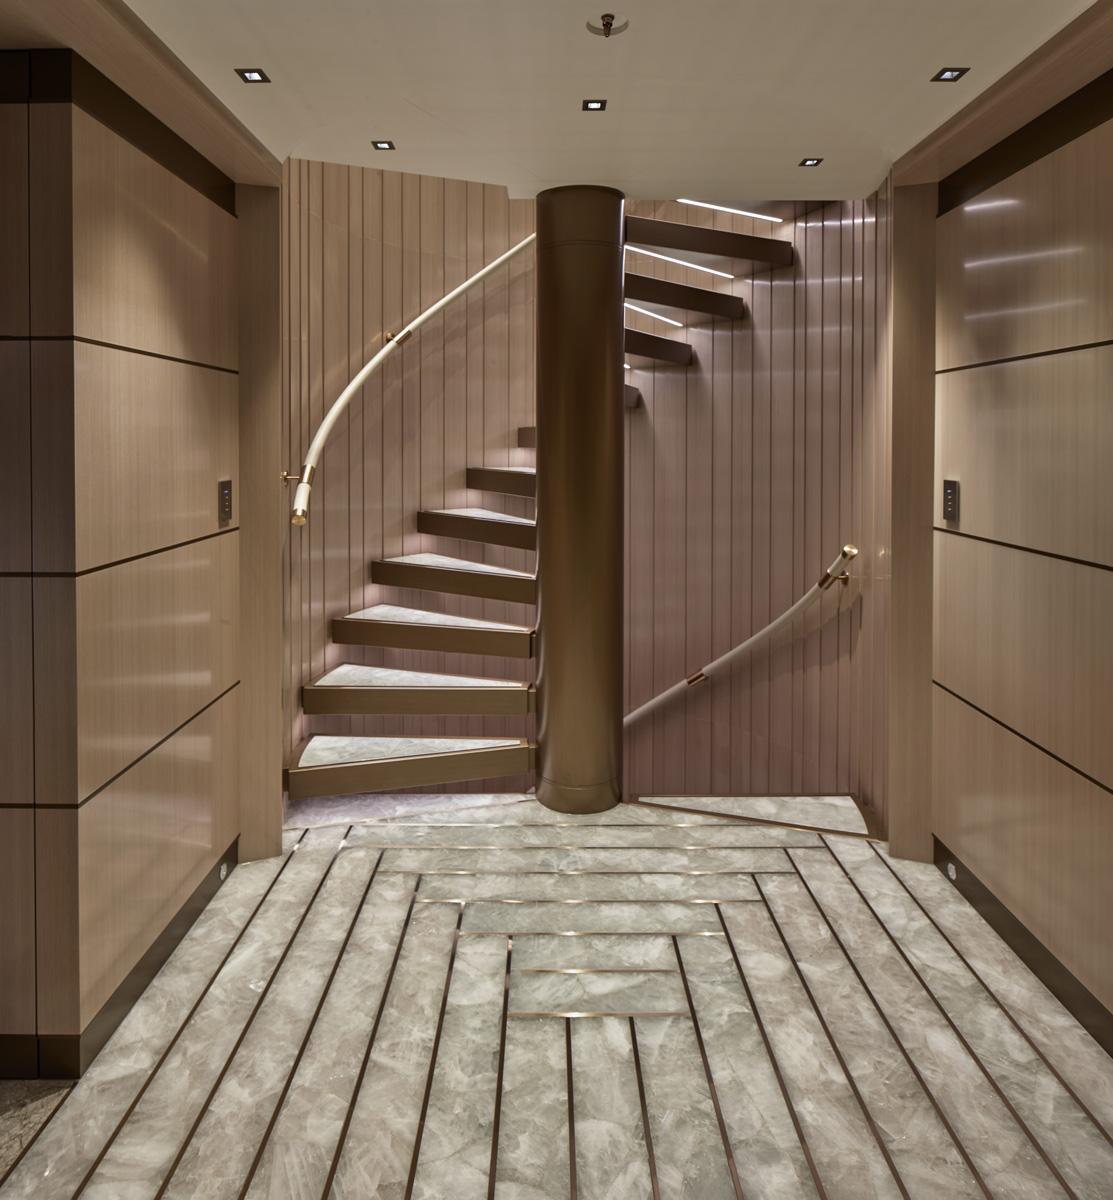 Maindeck Entrance Foyer